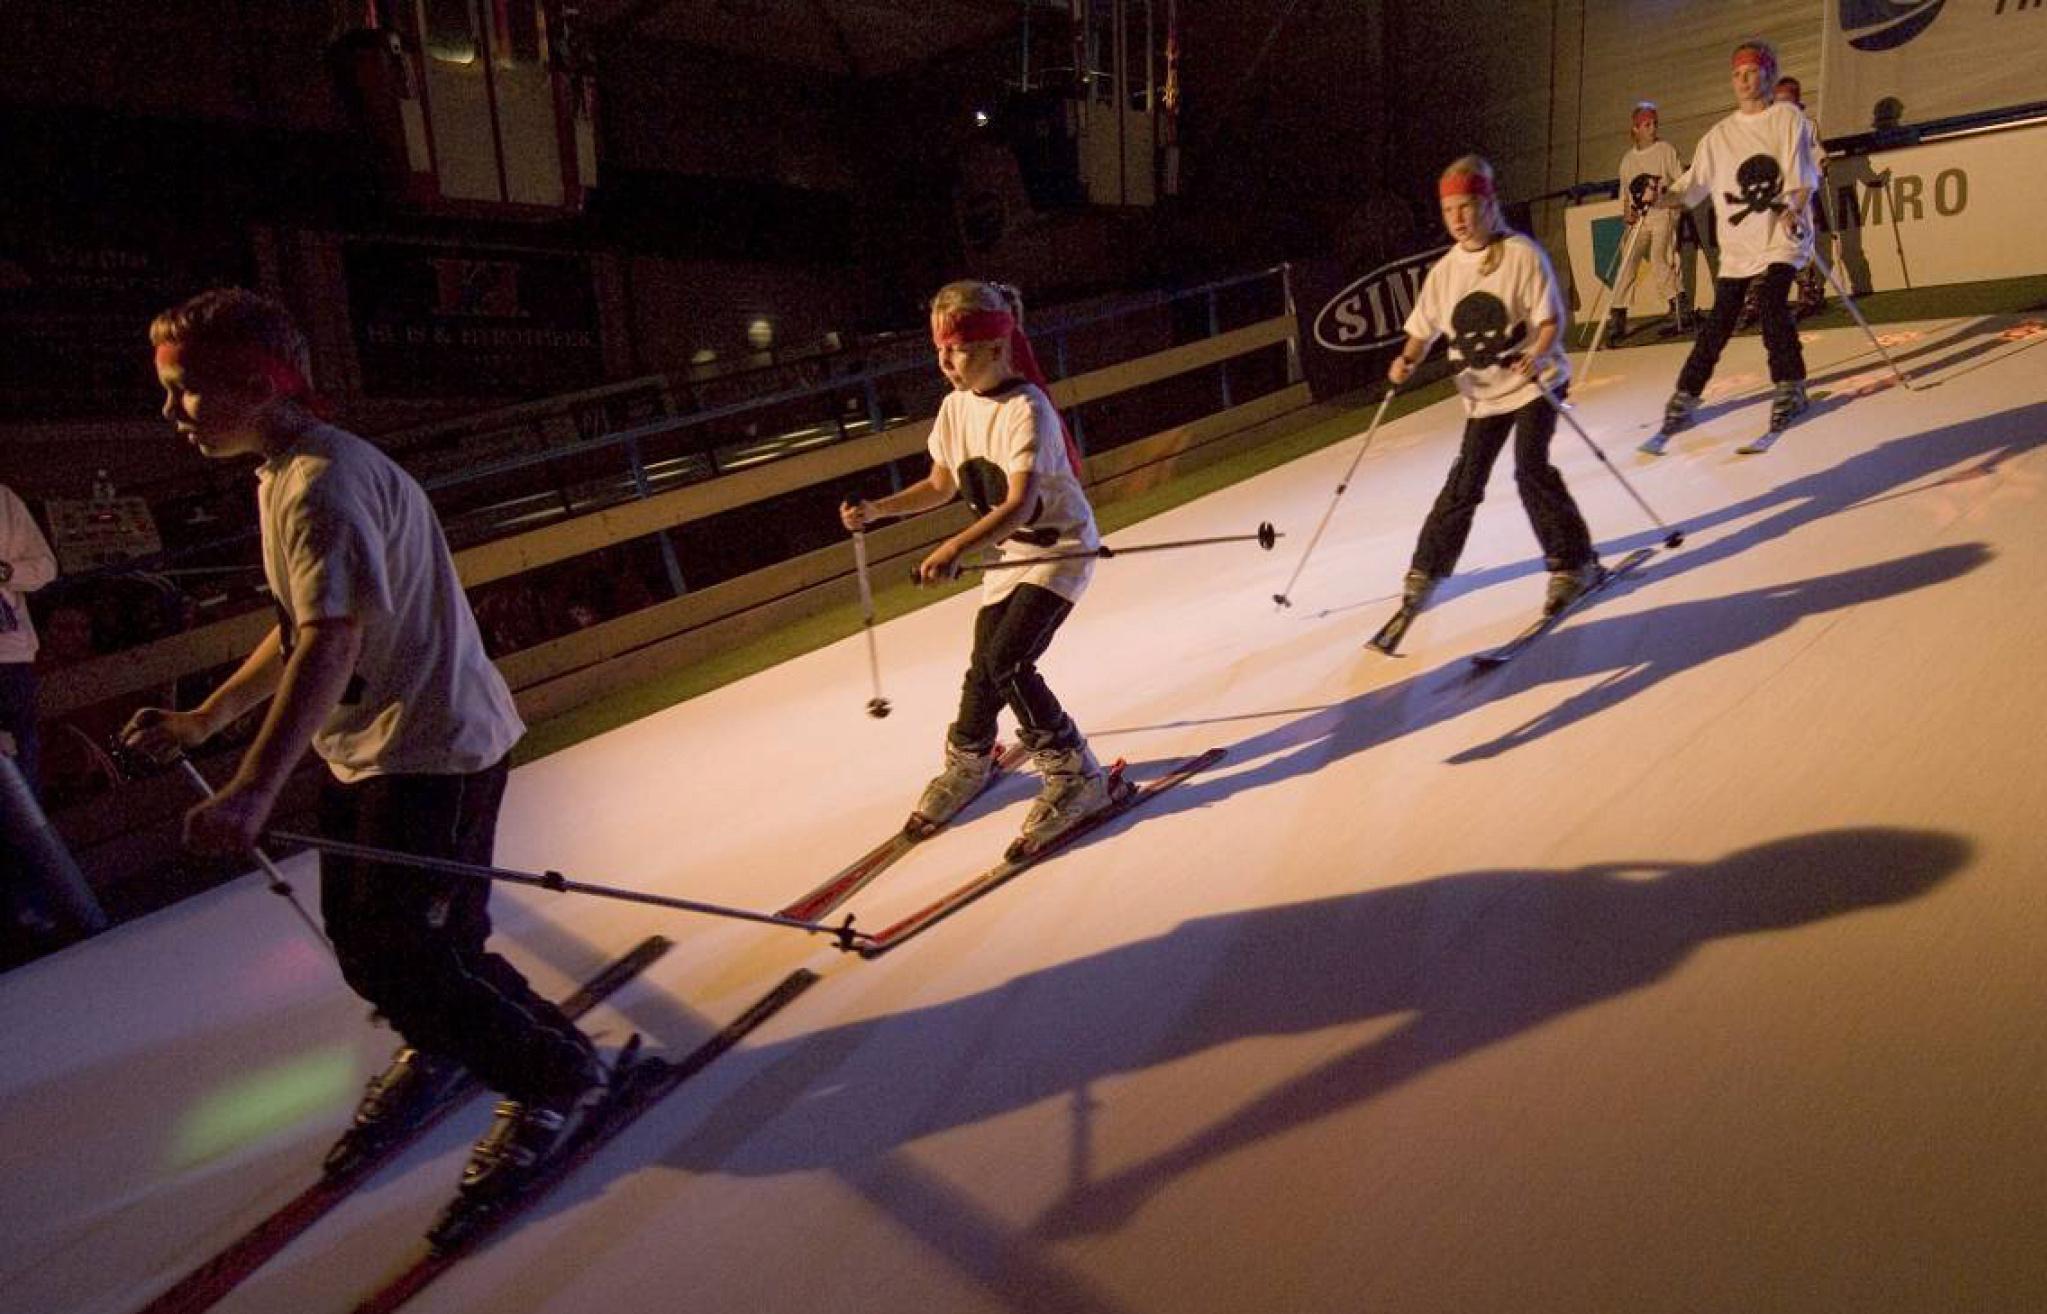 Skisportcentrum Hillegom failliet, eigenaar Erik du Pré is er 'kapot' van